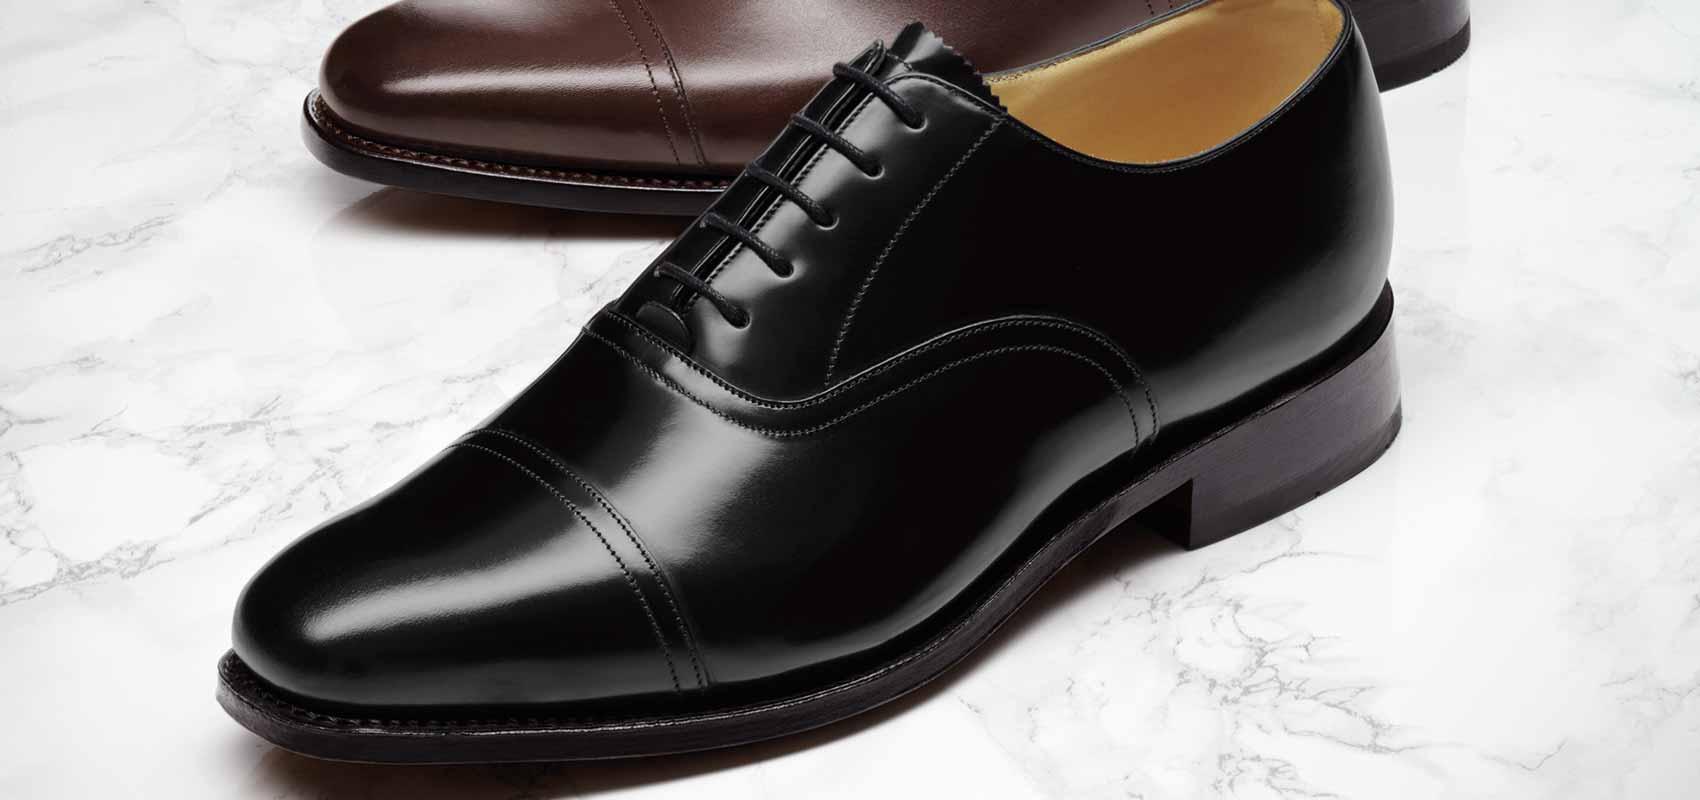 Charles Tyrwhitt business shoes